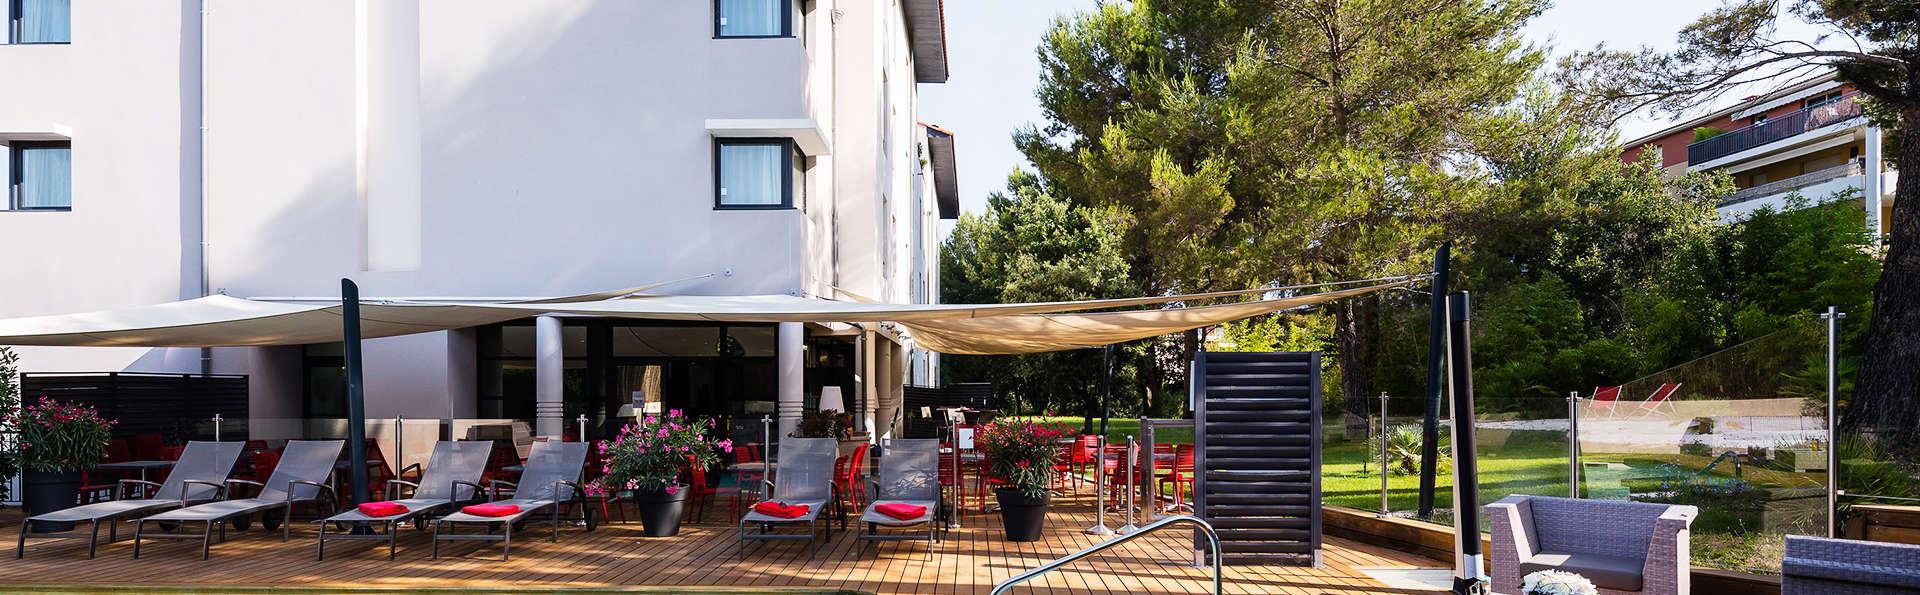 H tel de l 39 arbois h tel de charme aix en provence - Hotel de charme aix en provence ...